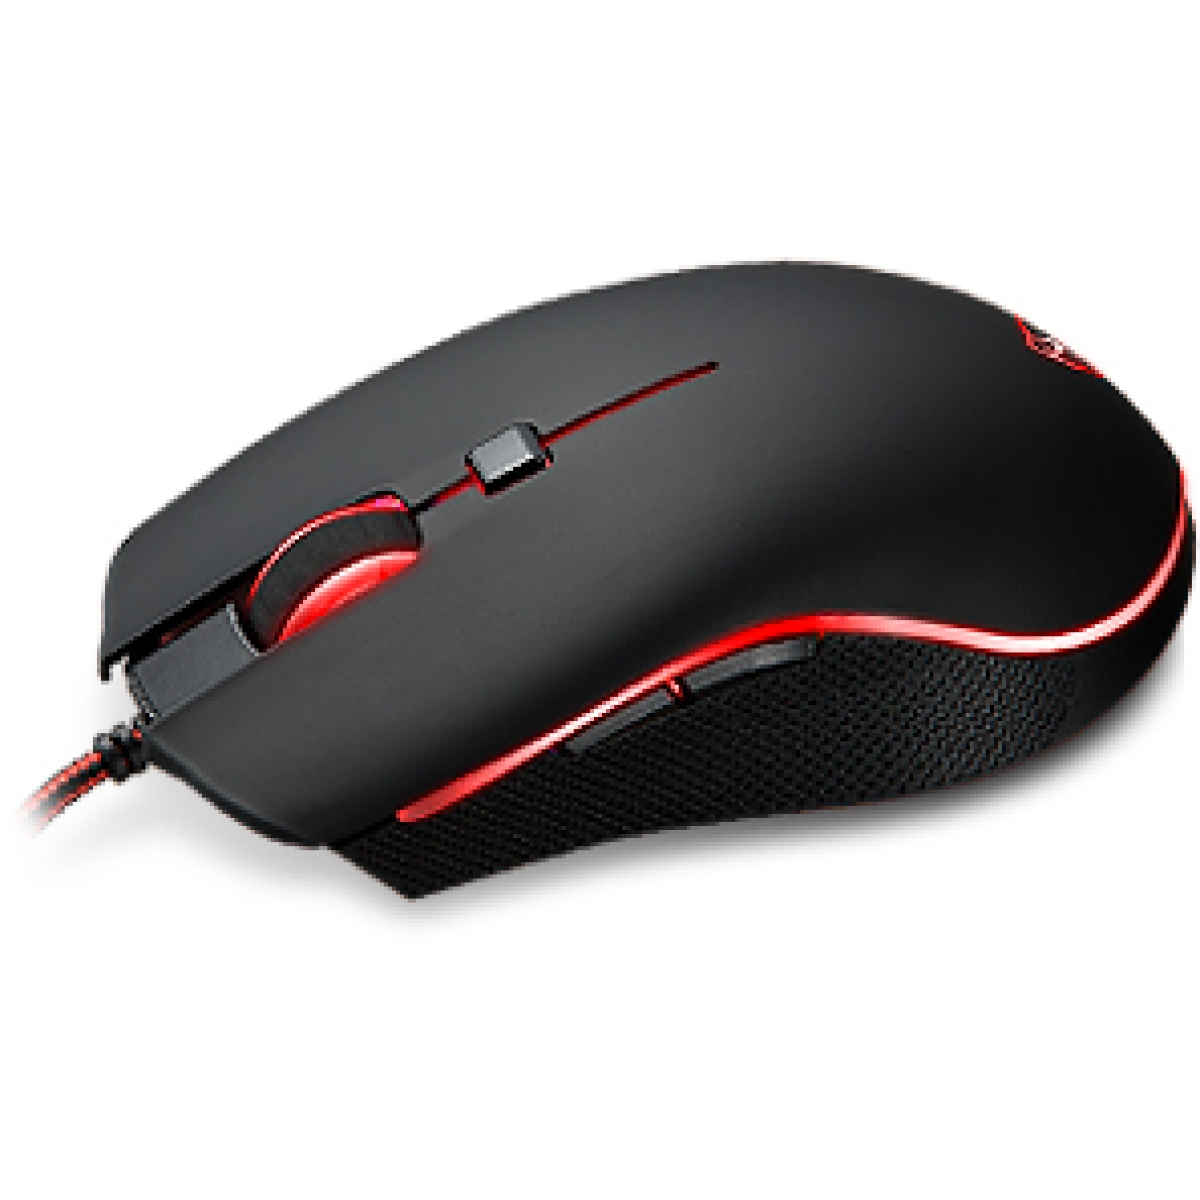 Mouse Gamer Motospeed V40, FMSMS0004PTO, 4000 DPI, RGB, Black